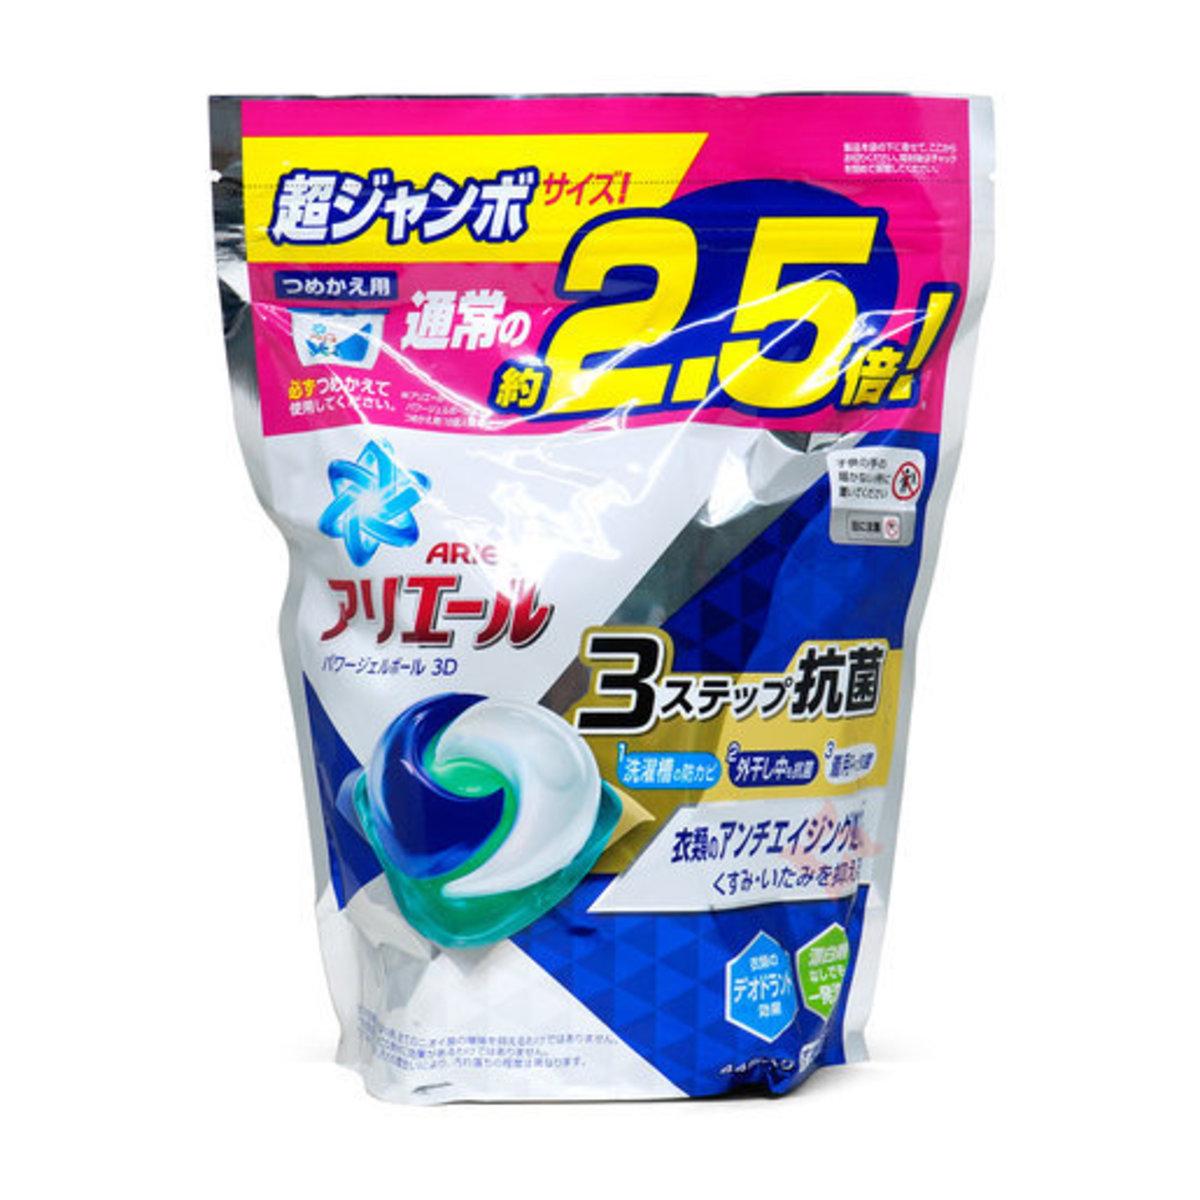 P&G - 3D淨白消臭洗衣球 44粒入 (白) (平行進口)